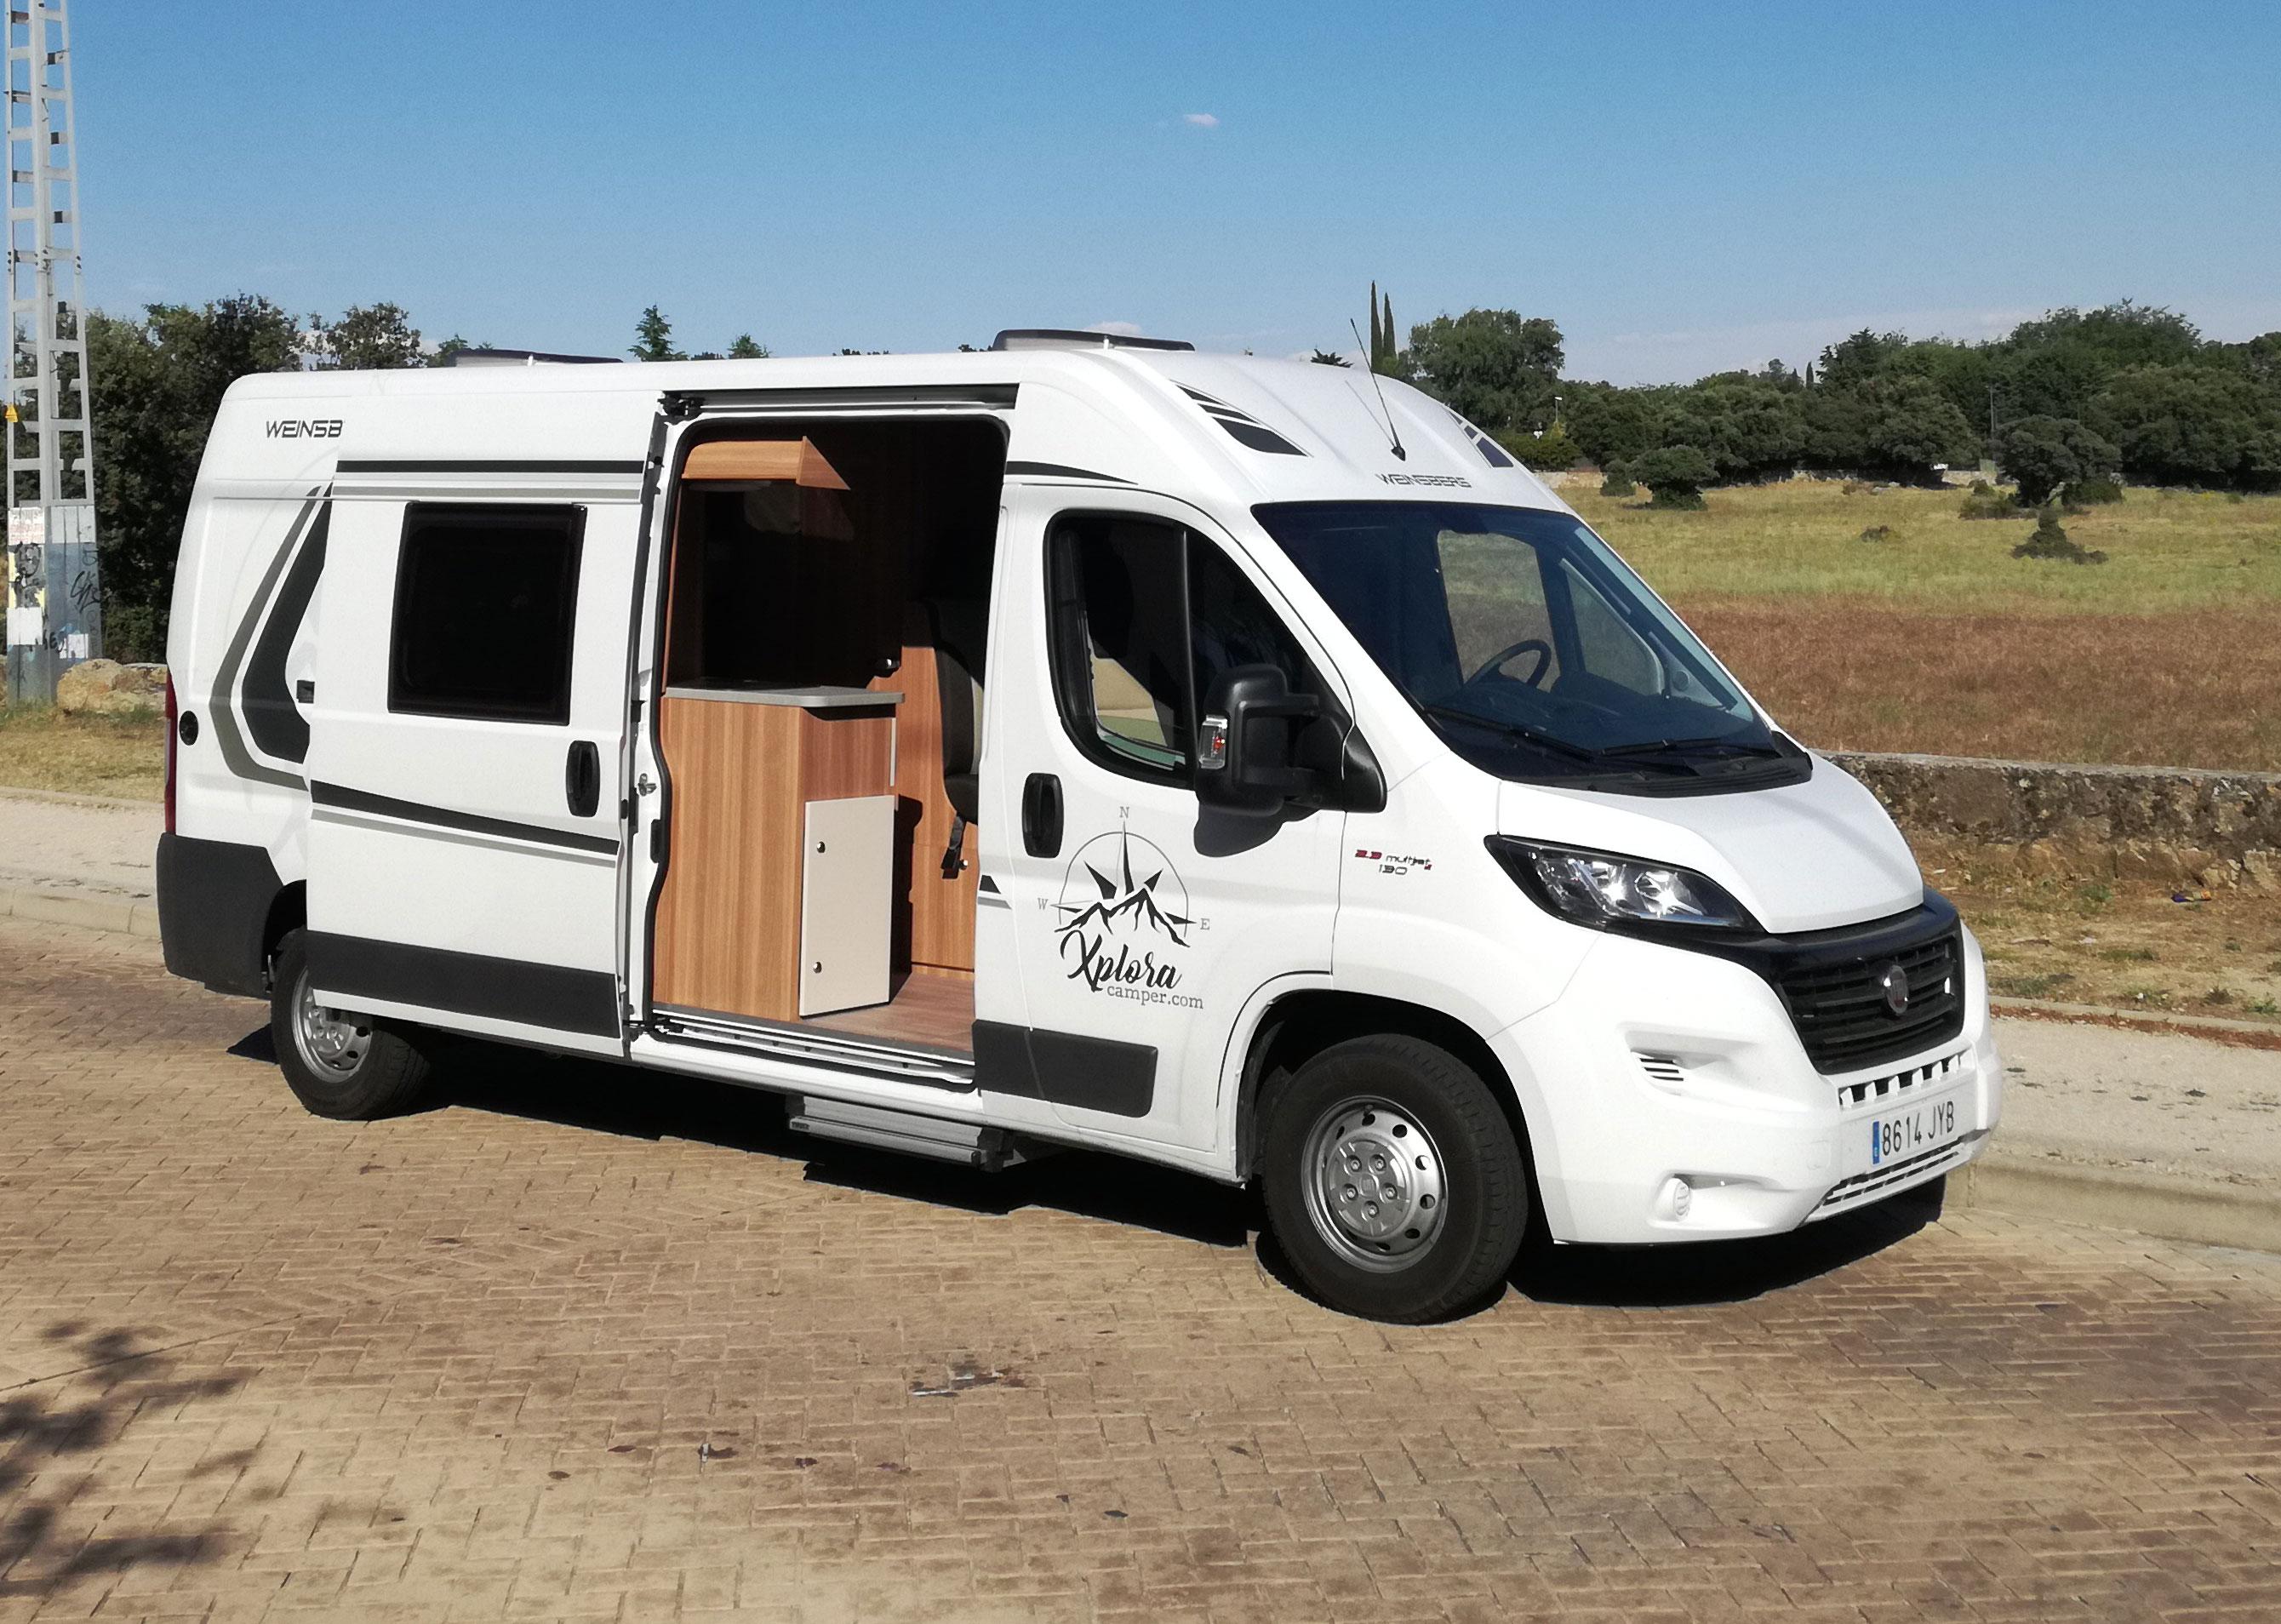 Una furgoneta camper la mejor soluci n para los for Vendo furgoneta camper